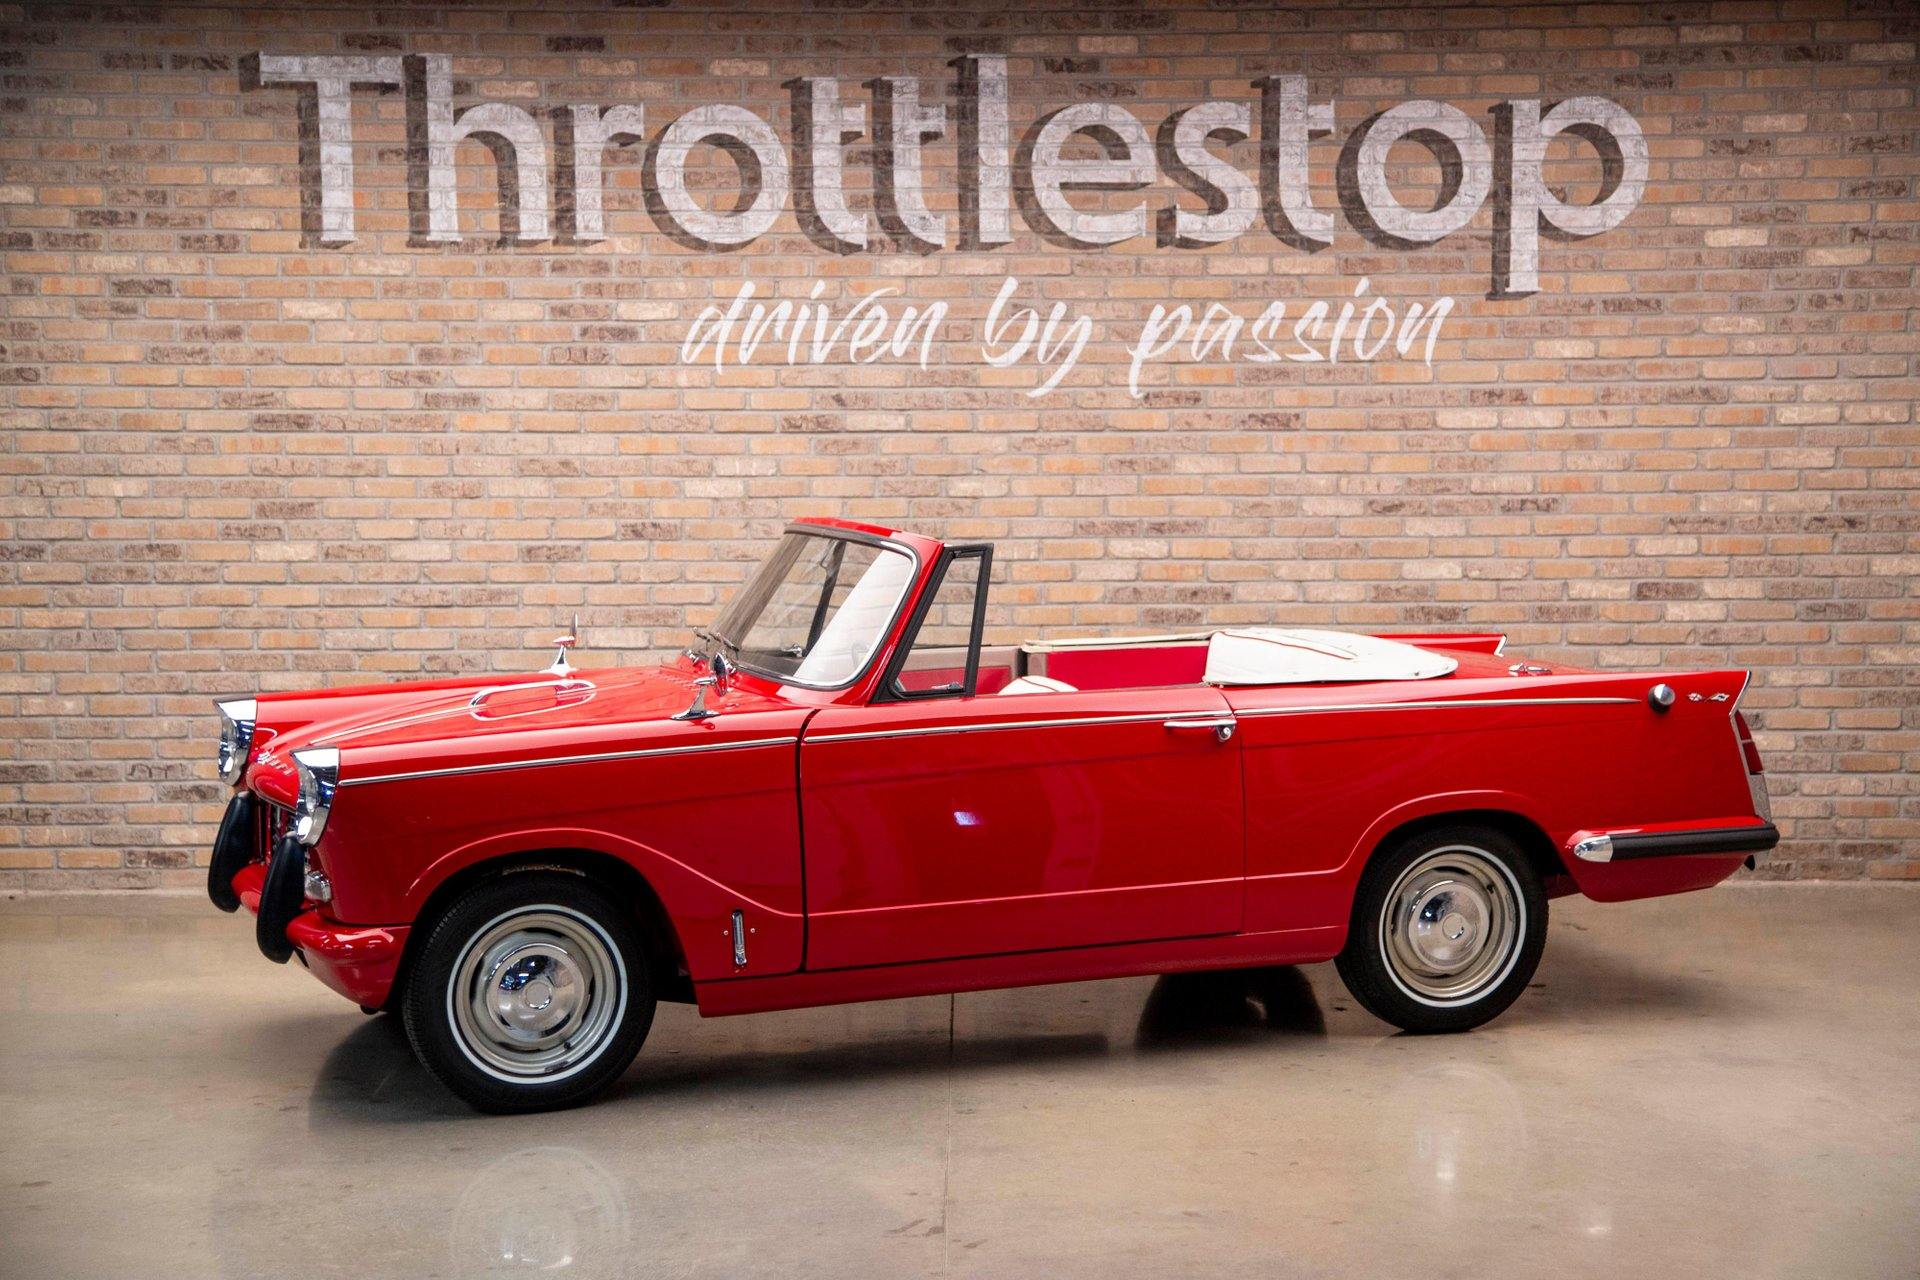 1960 triumph herald convertible